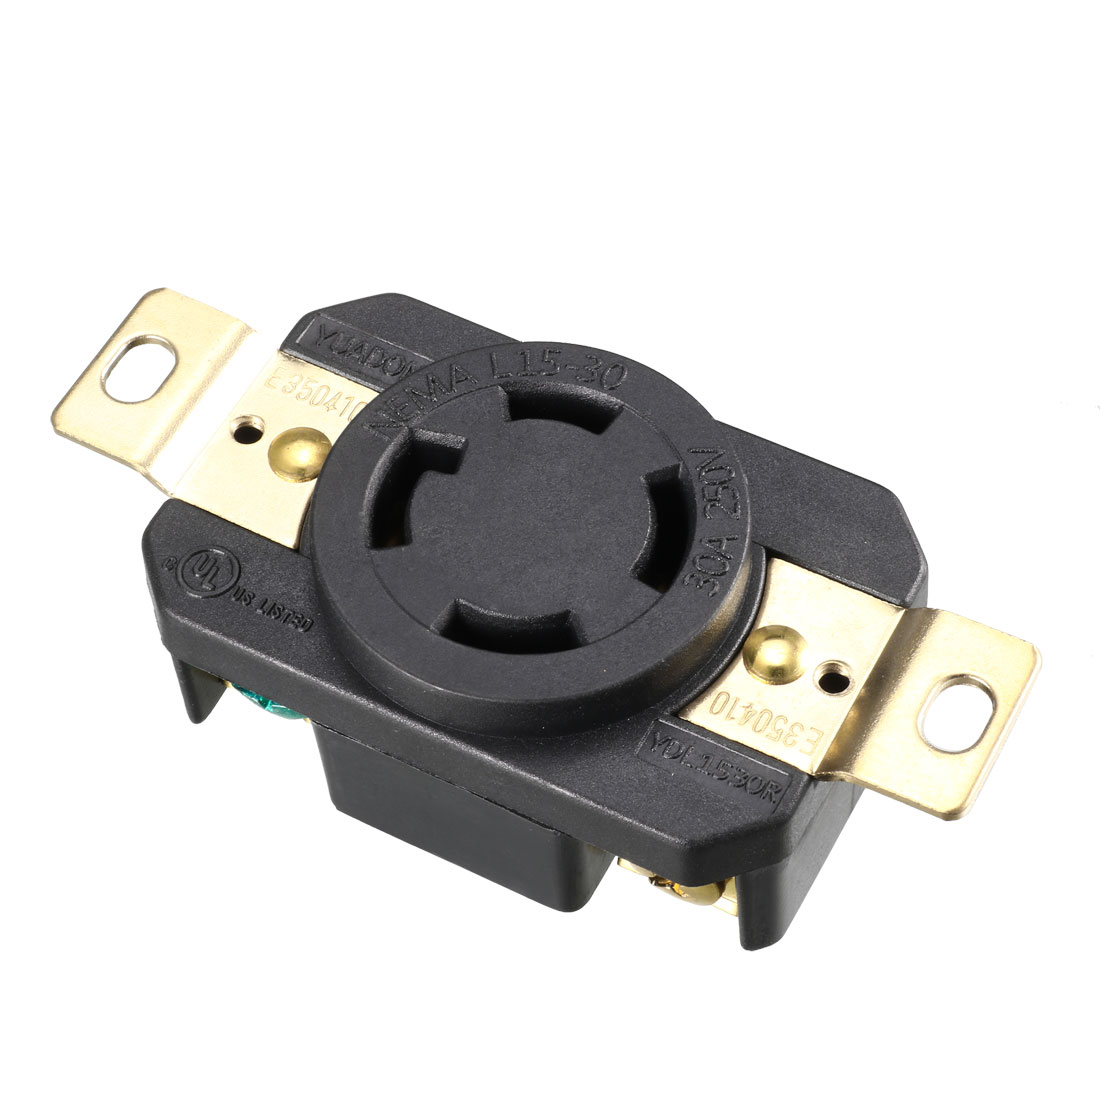 Locking Connector Female NEMA L15-30C, 30A 250VAC 3 Pole 4 Wire Grounding